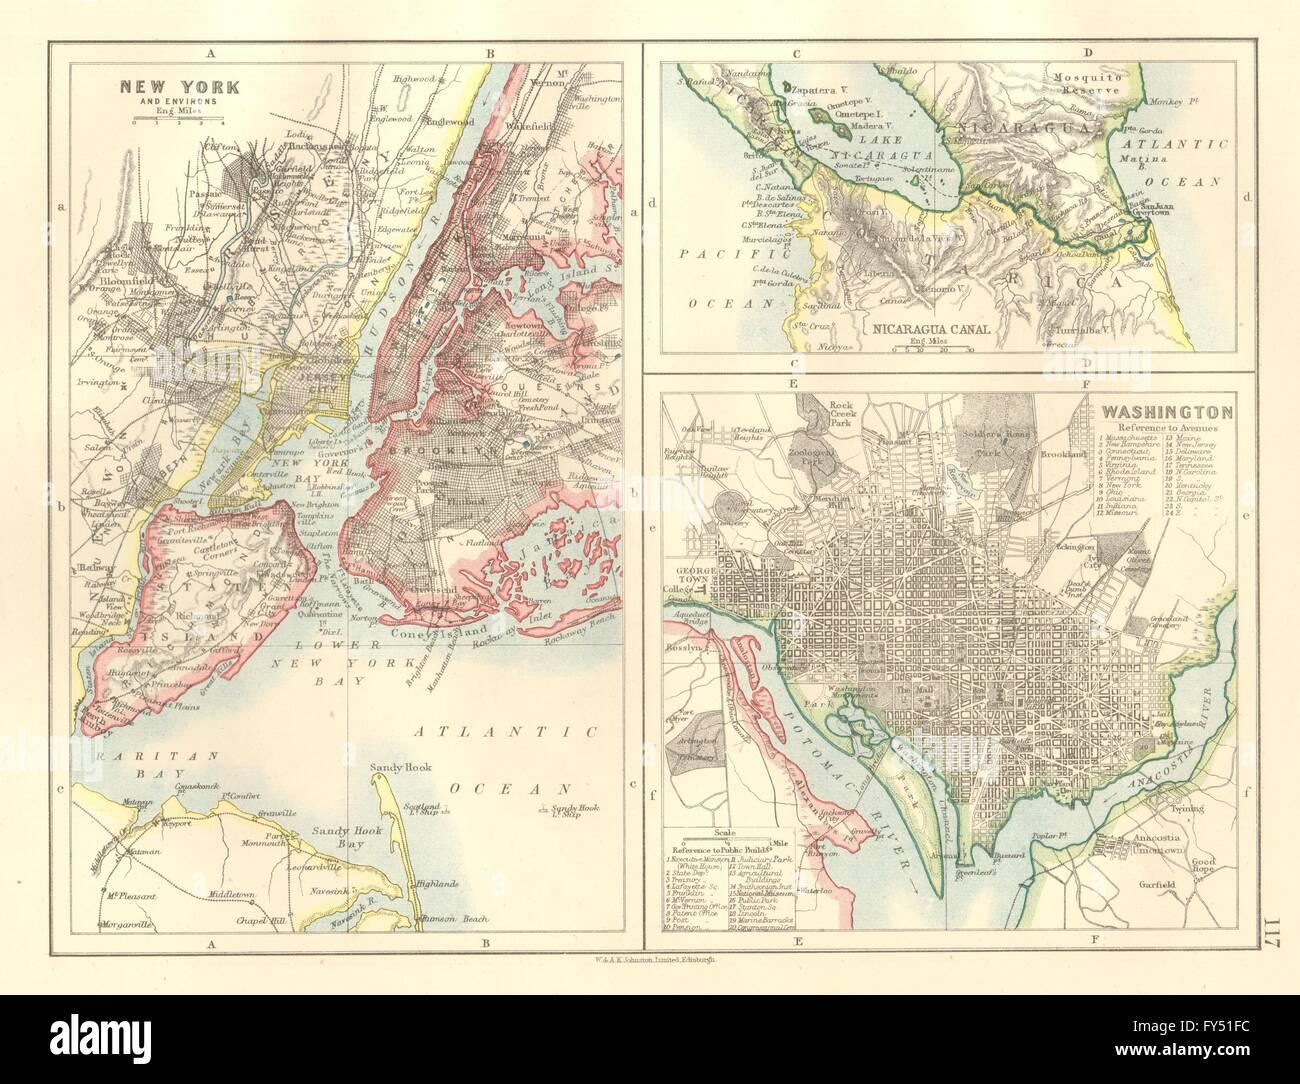 US CITIESNICARAGUA CANALNew York Washington Plans JOHNSTON - 1920 map of us